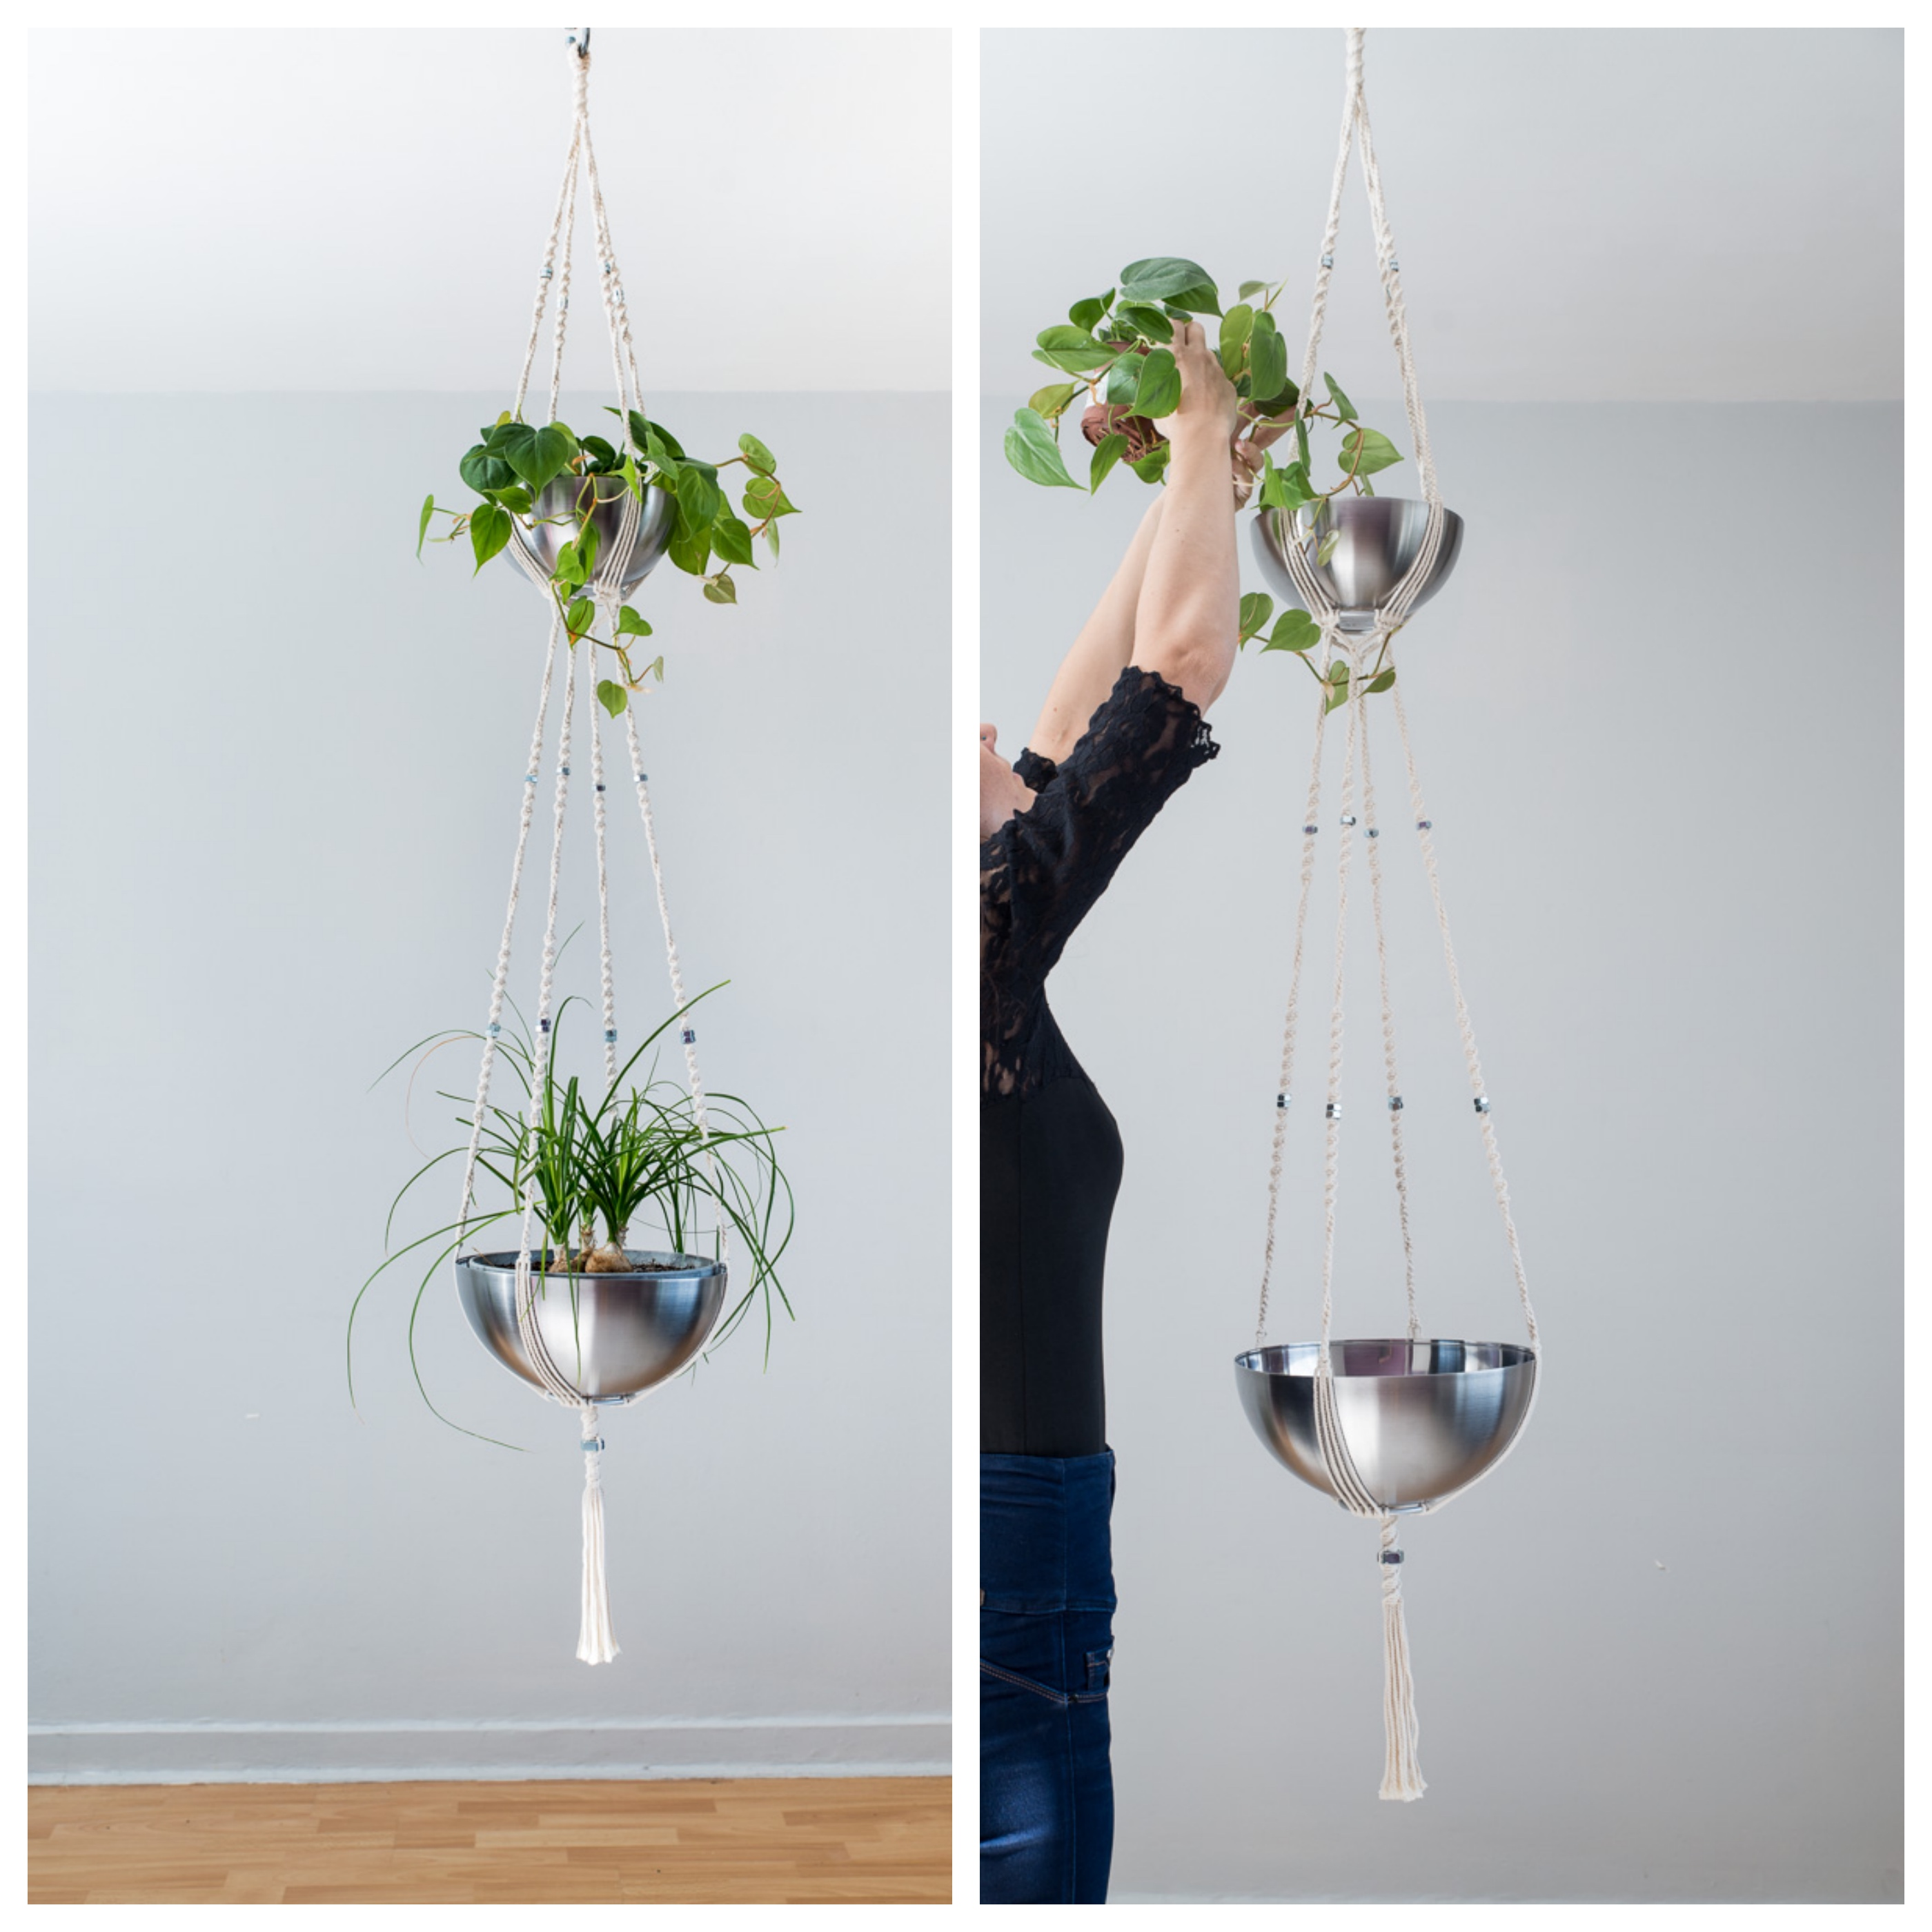 suspension pour plantes 2 tages bymadjo equinox d co. Black Bedroom Furniture Sets. Home Design Ideas